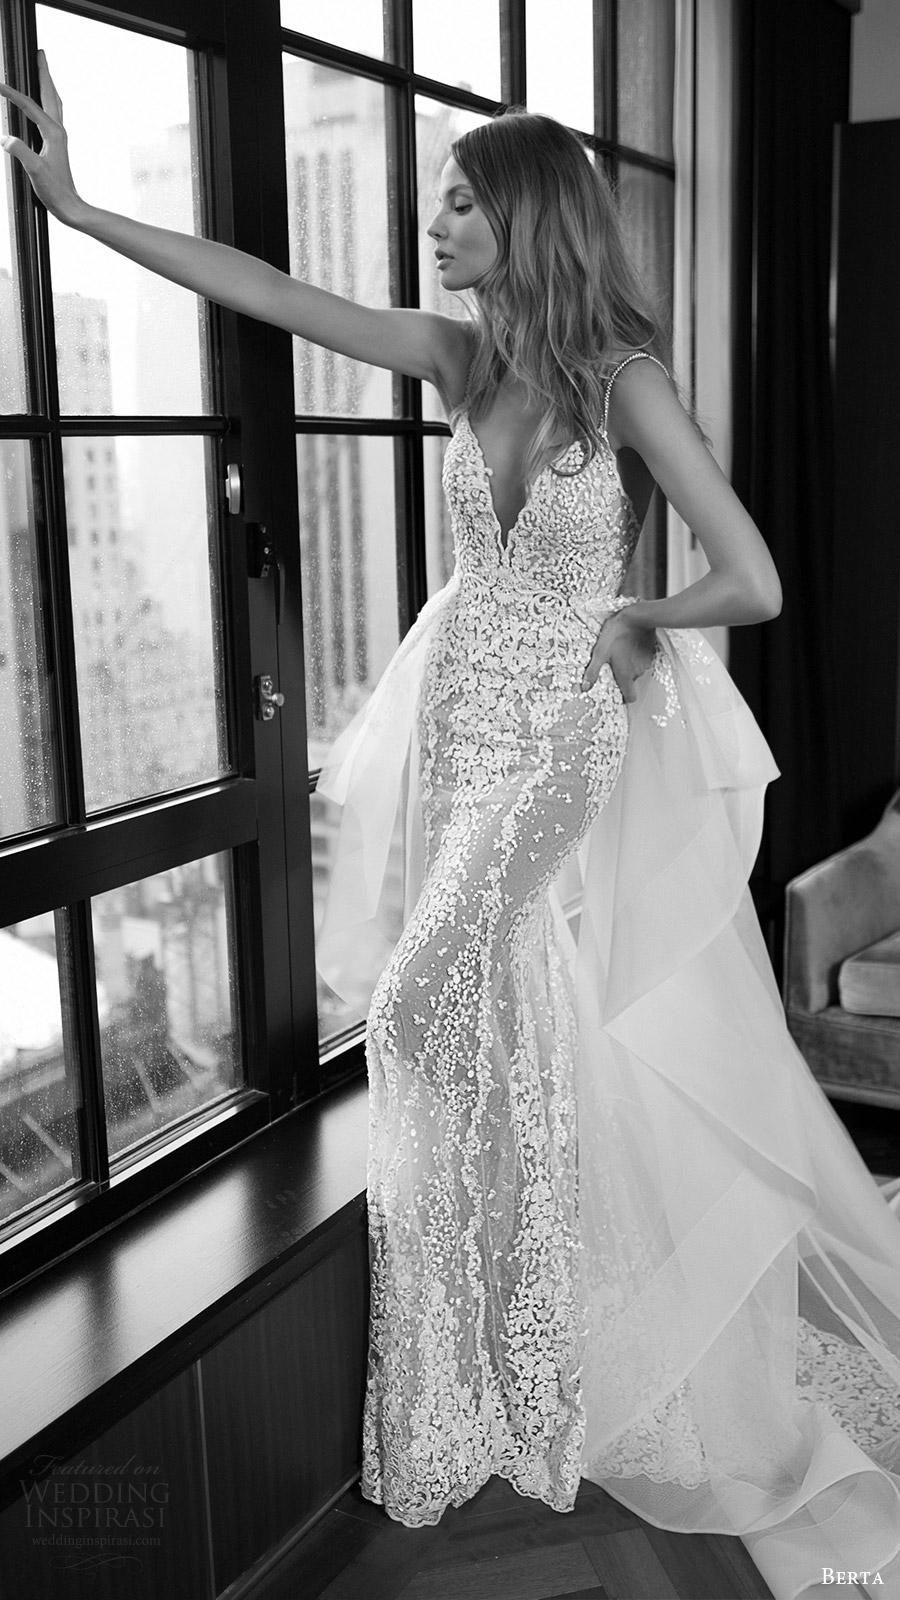 berta bridal fall 2016 sleeveless vneck sheath wedding dress (16 108) mv overskirt train